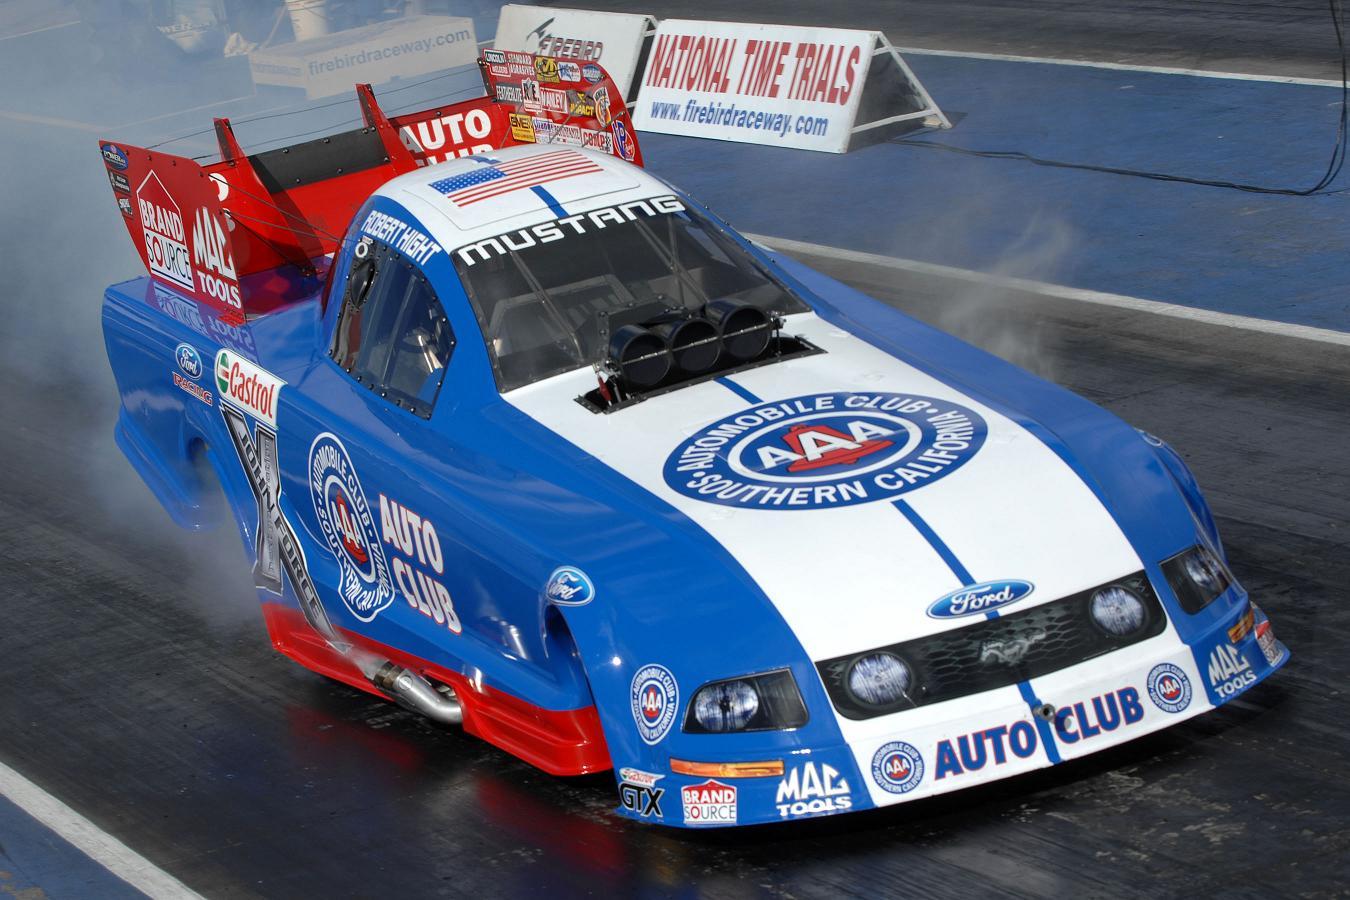 Ford Drag Racing news: Hight